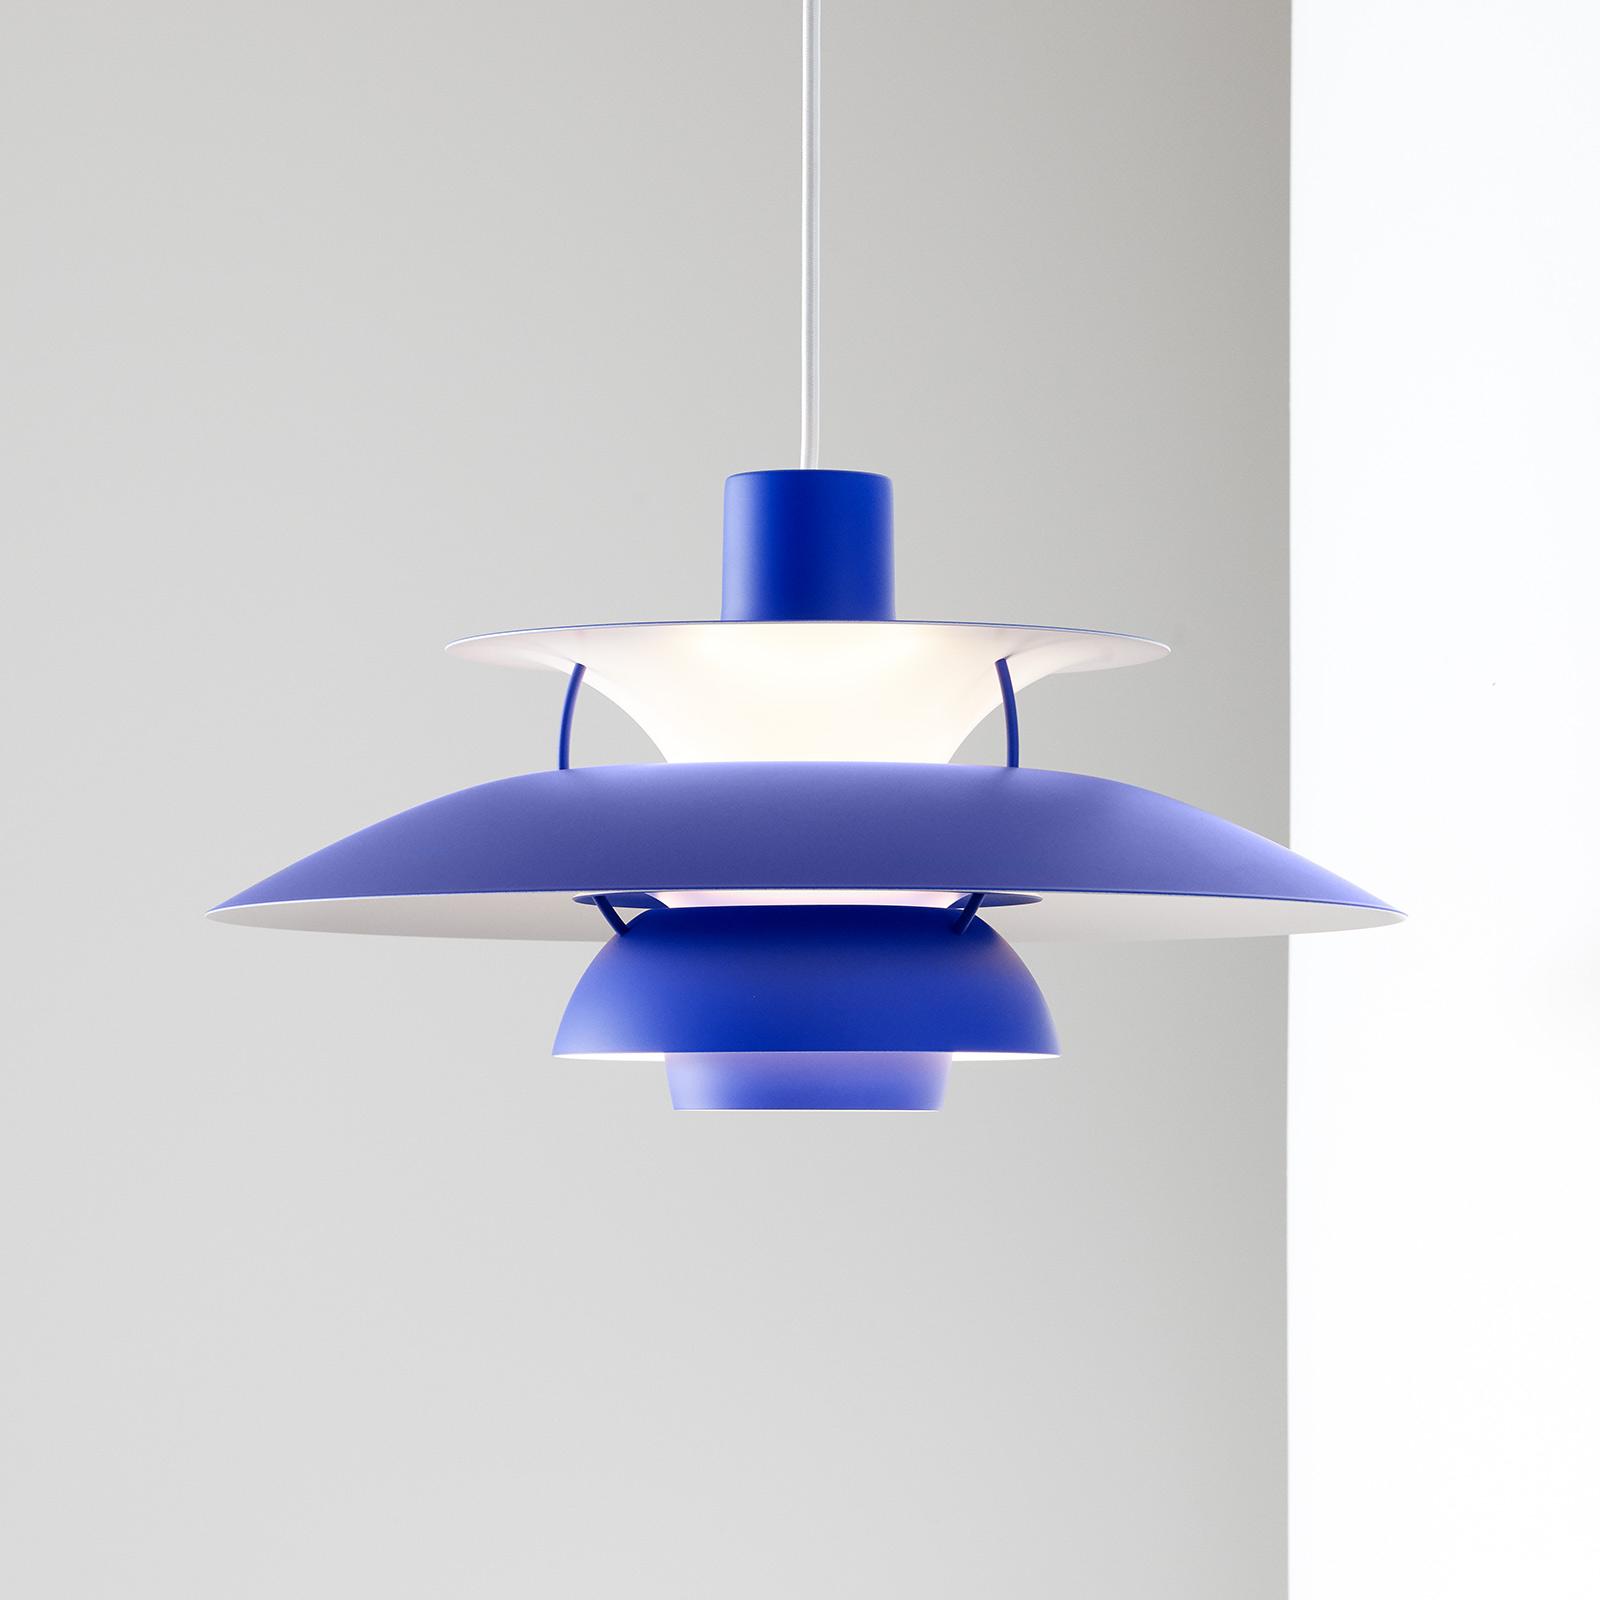 Louis Poulsen PH 5 hanglamp monochroom blauw